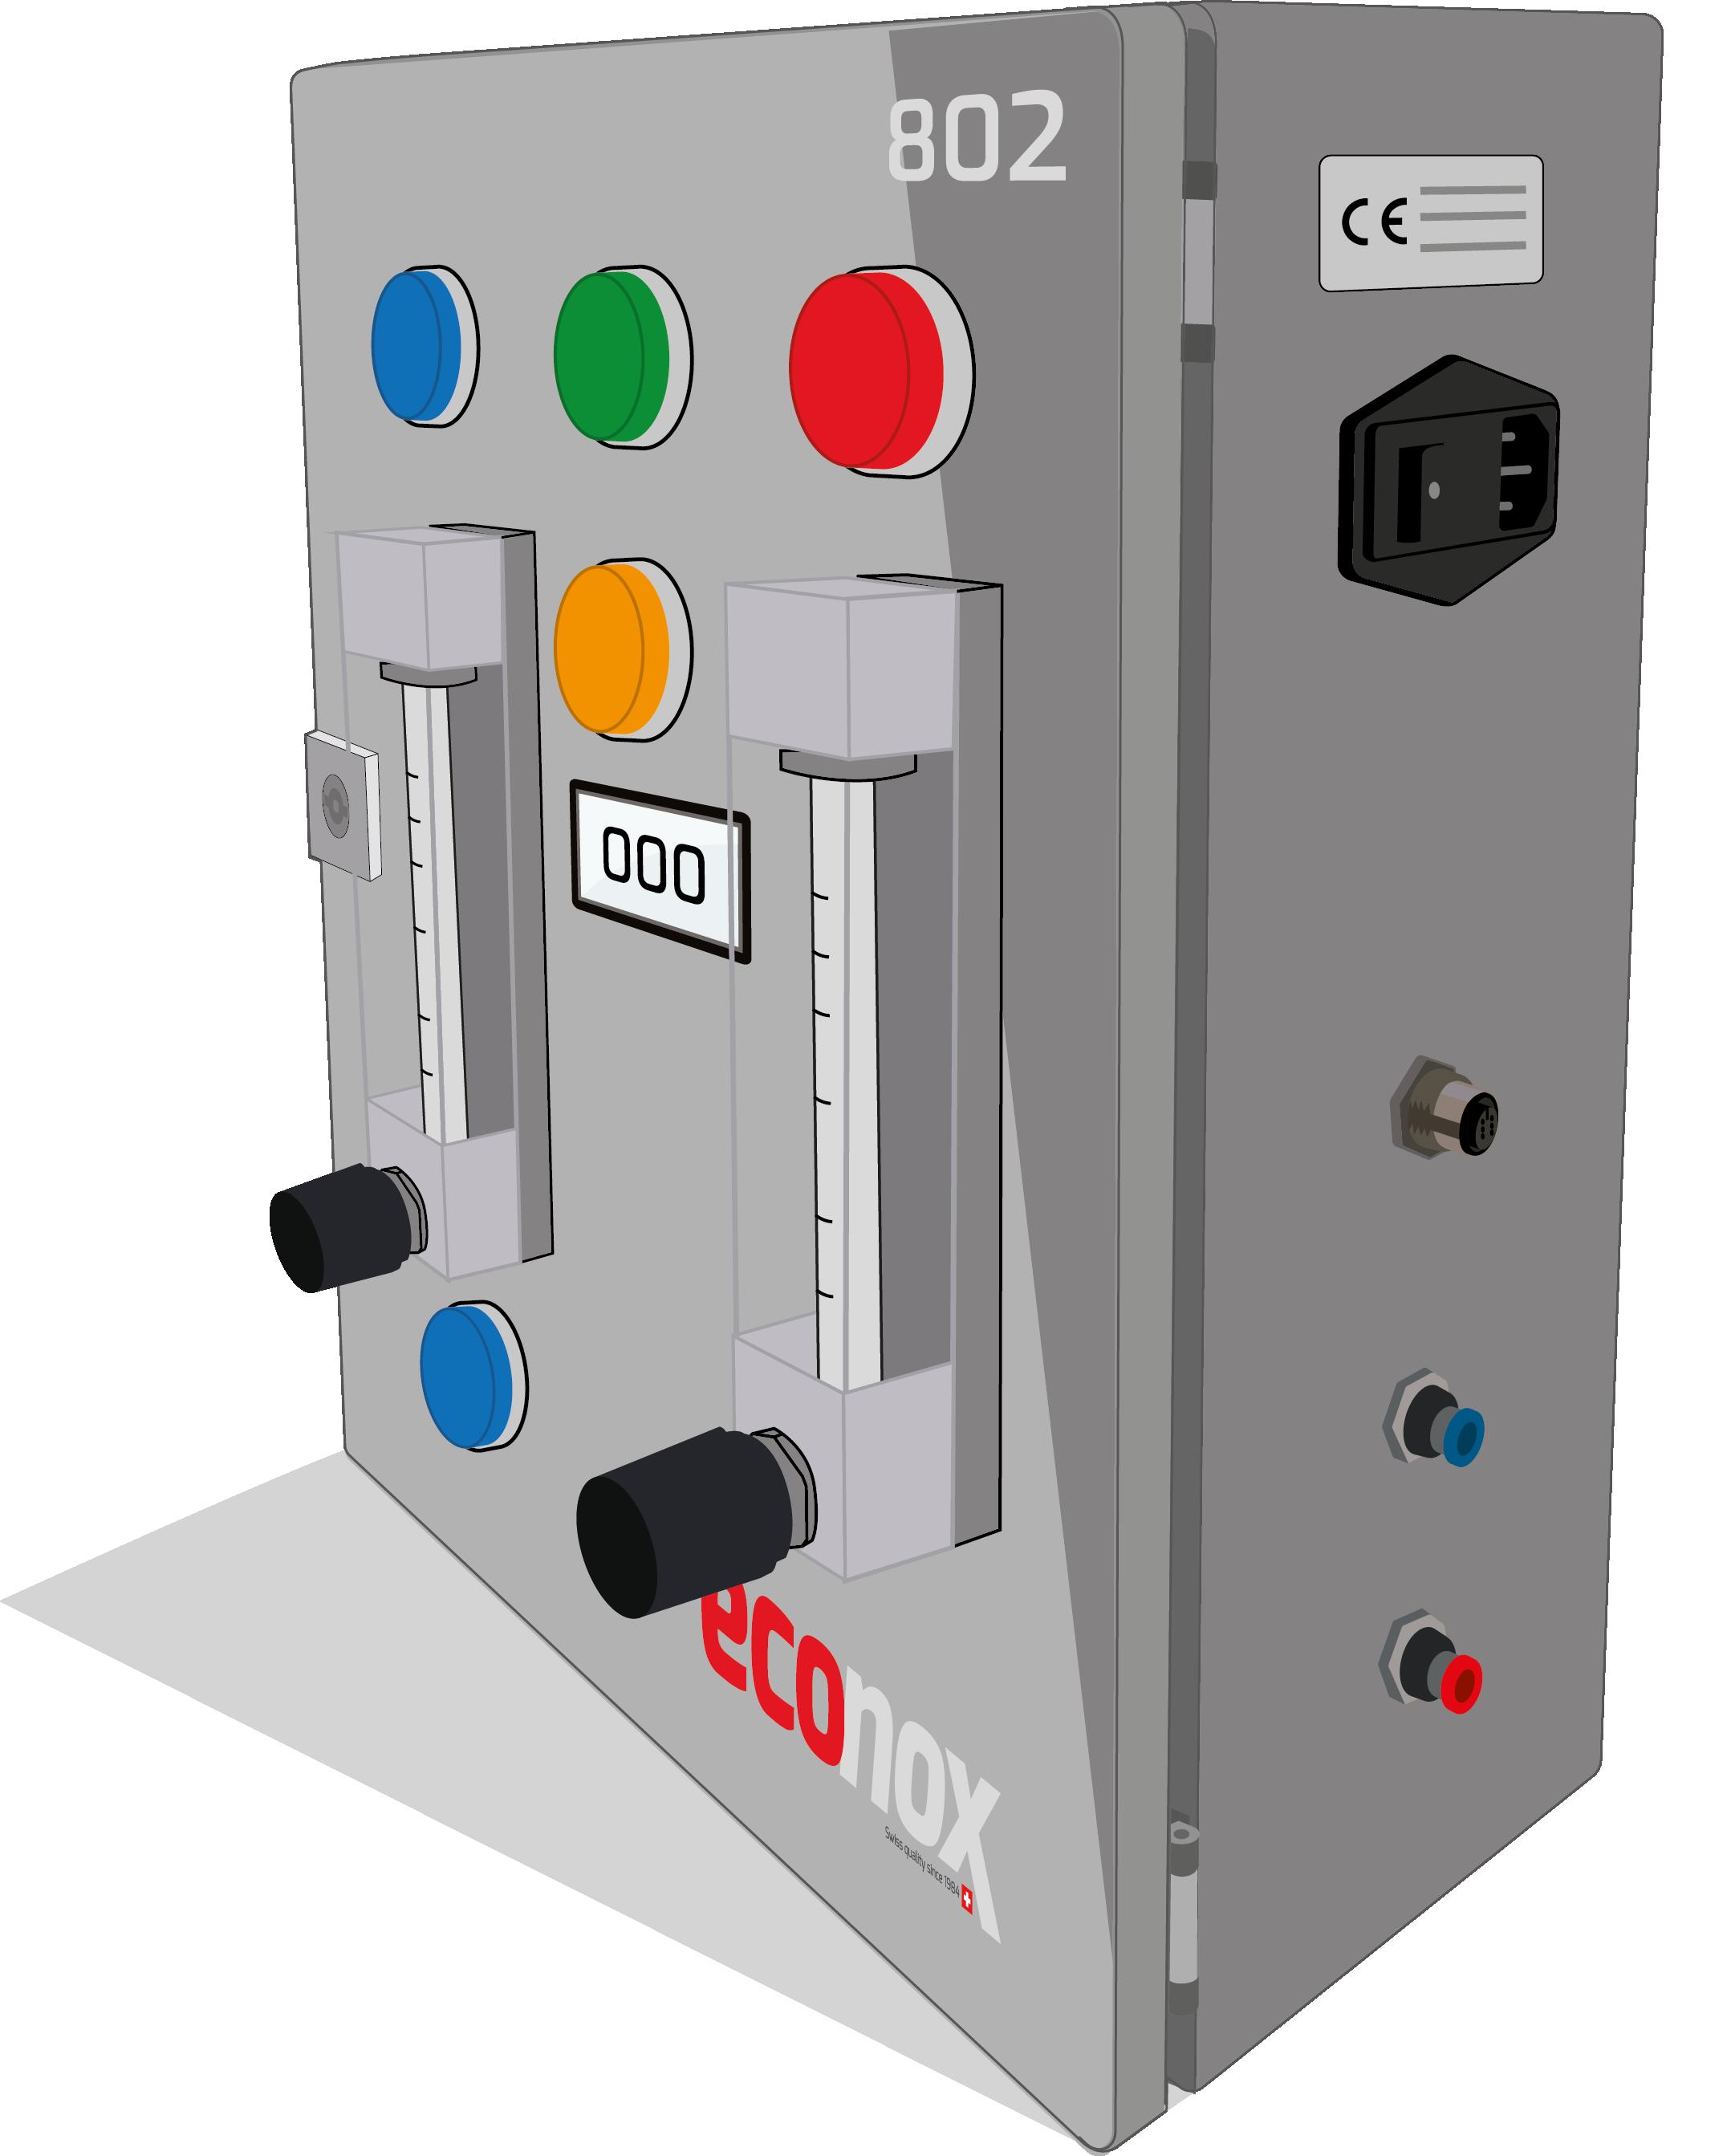 Module de maintenance 802